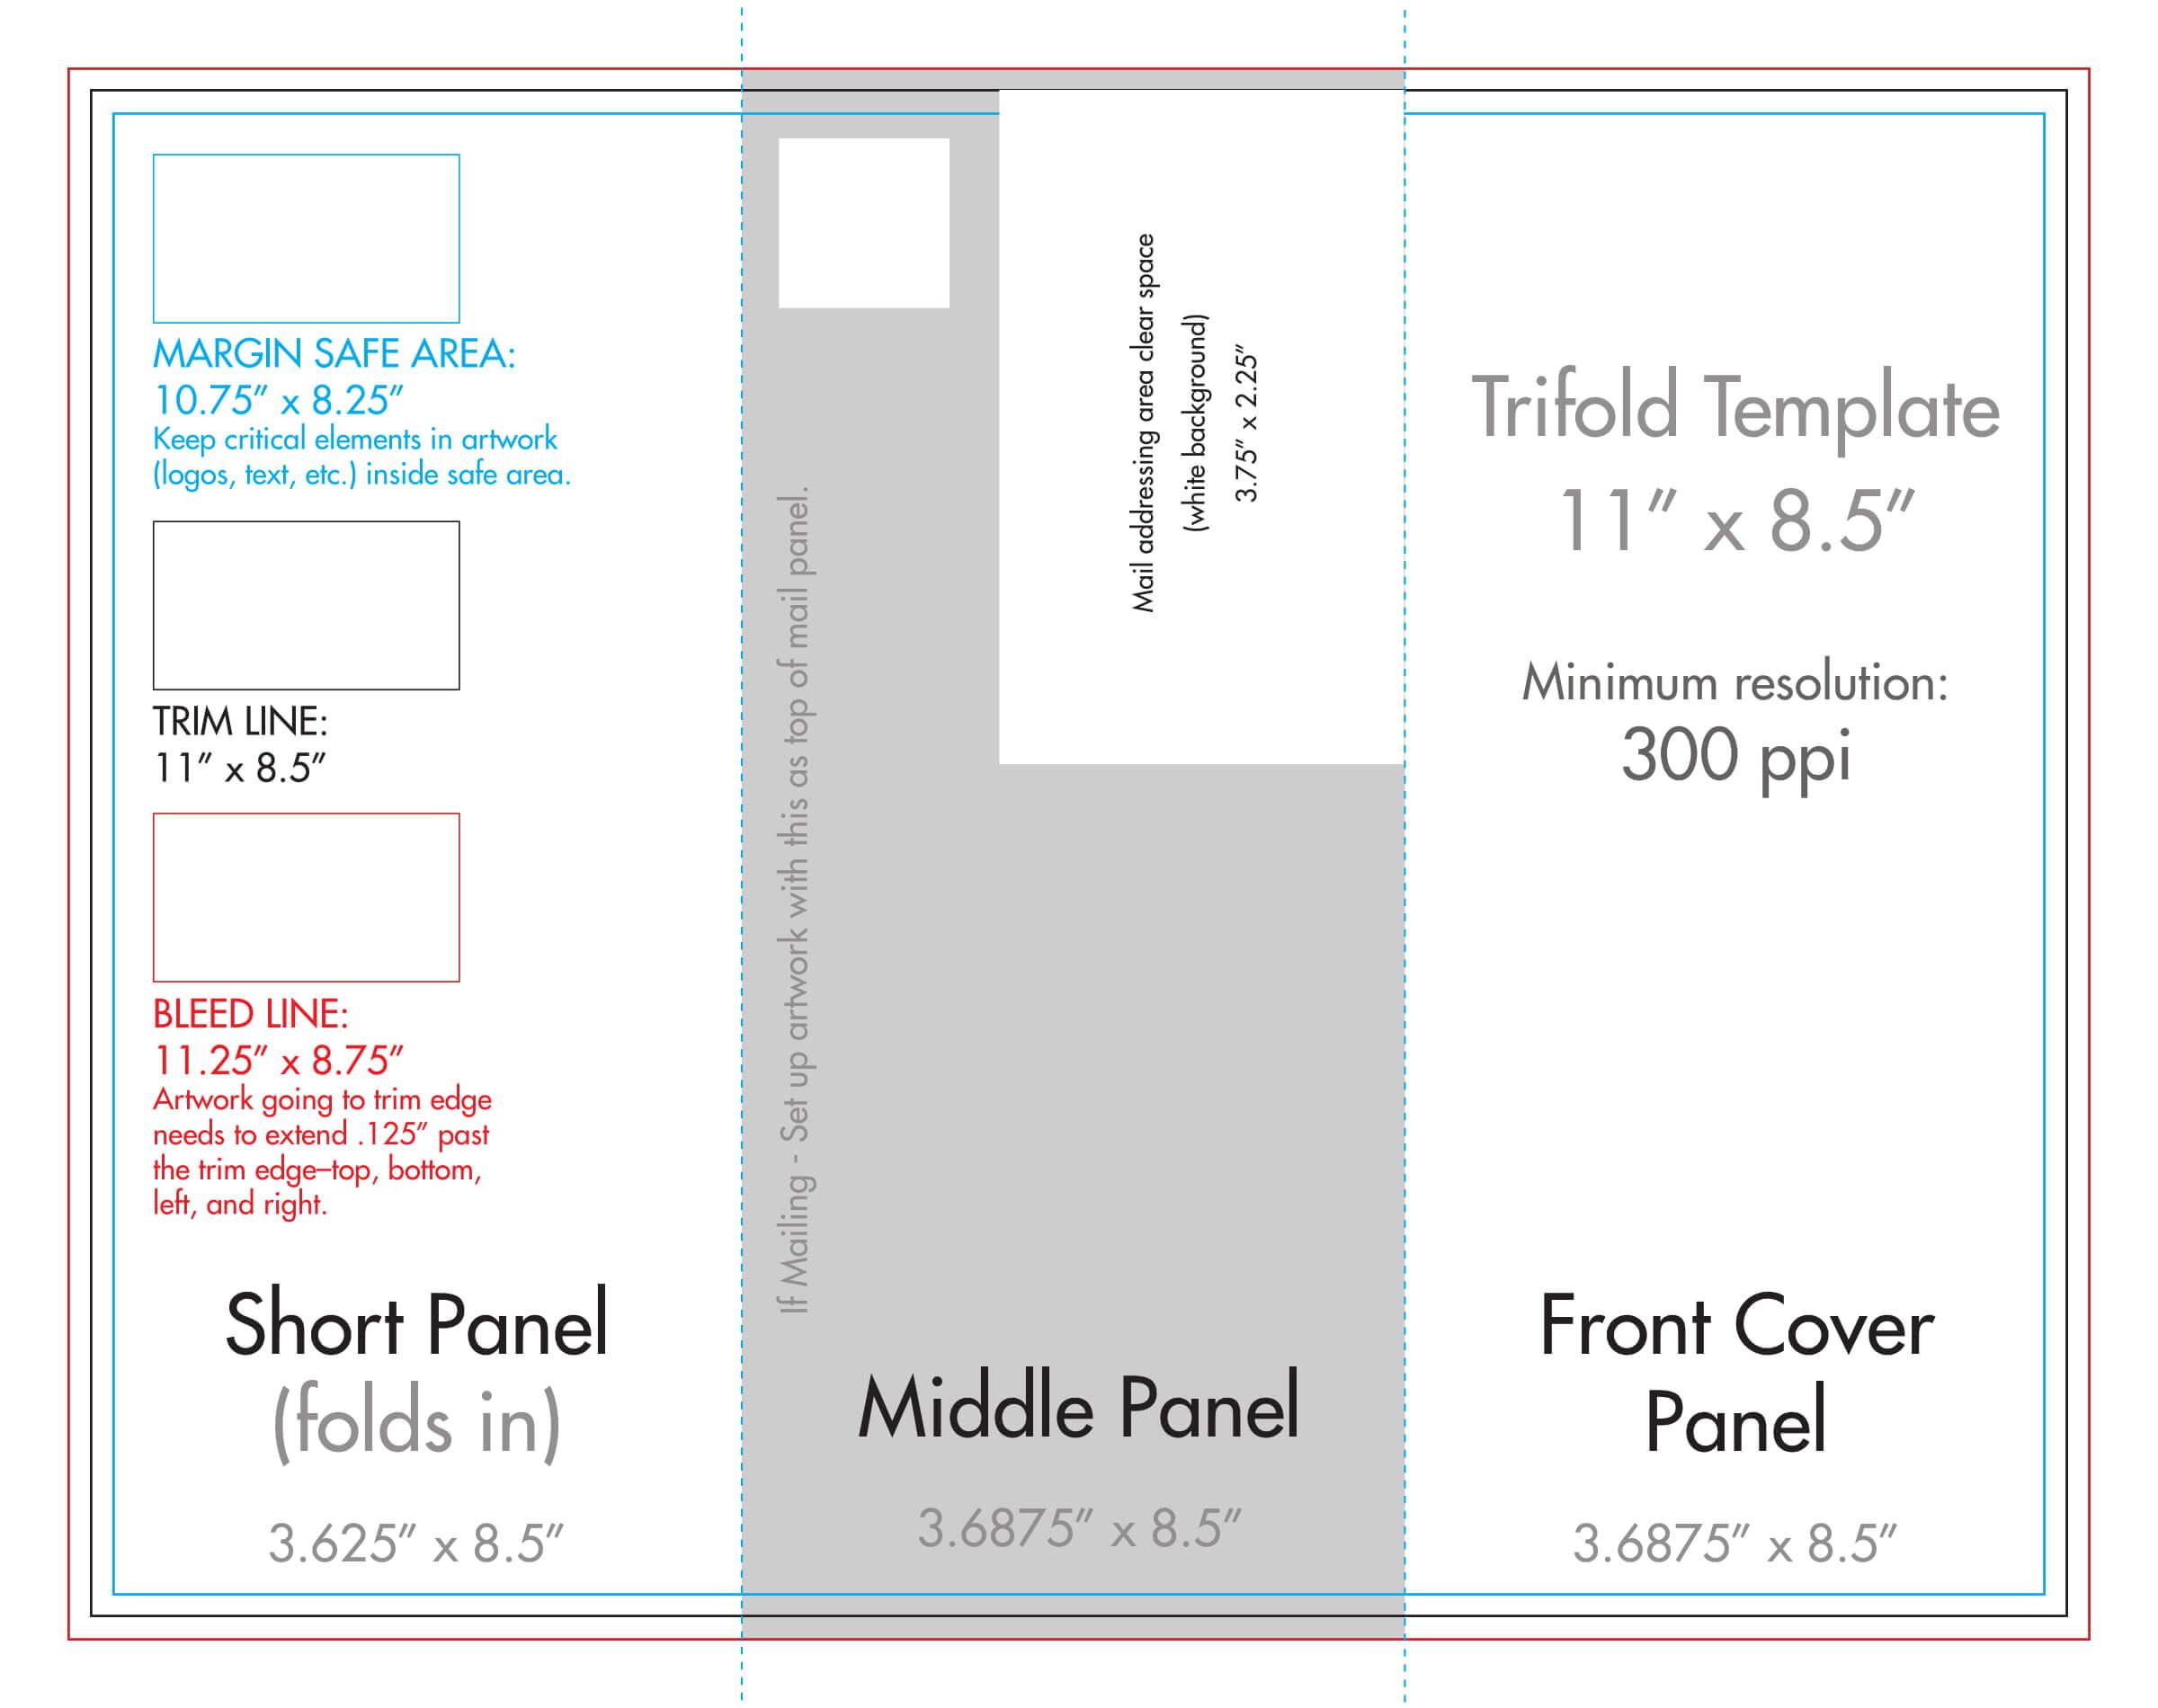 "8.5"" X 11"" Tri Fold Brochure Template - U.s. Press Regarding 8.5 X11 Brochure Template"